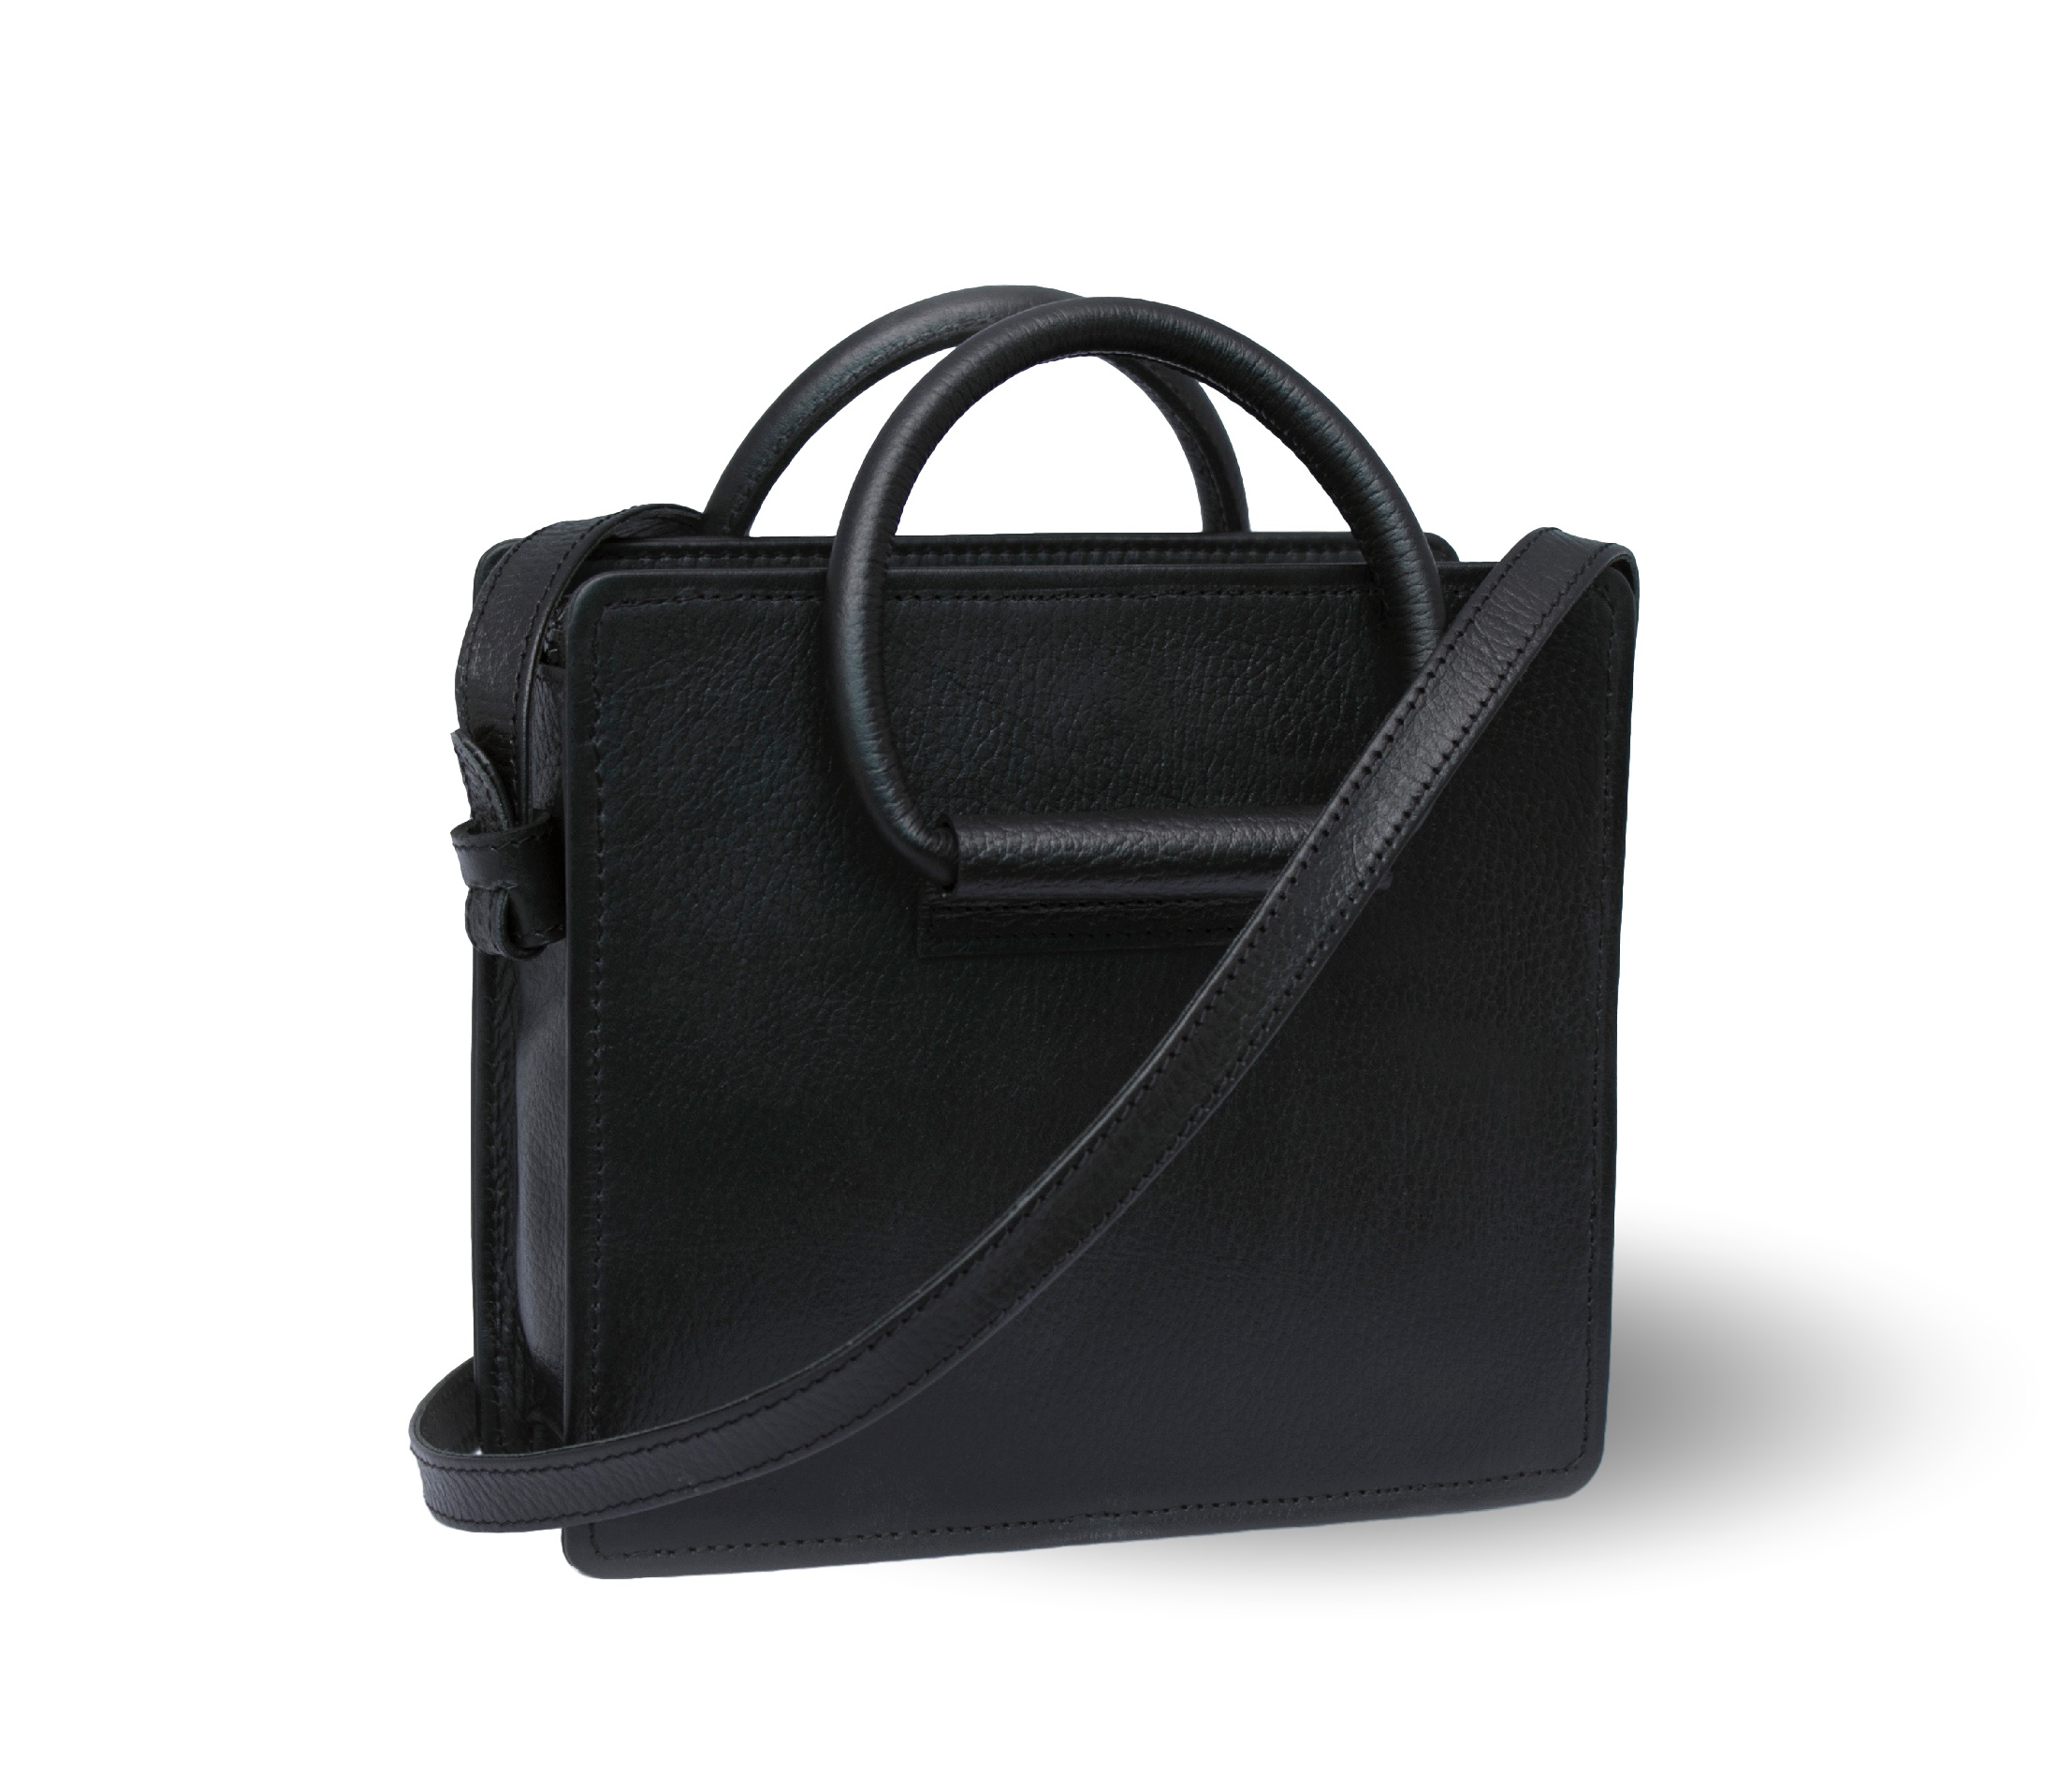 Celestino Black Handbag from FerWay Designs